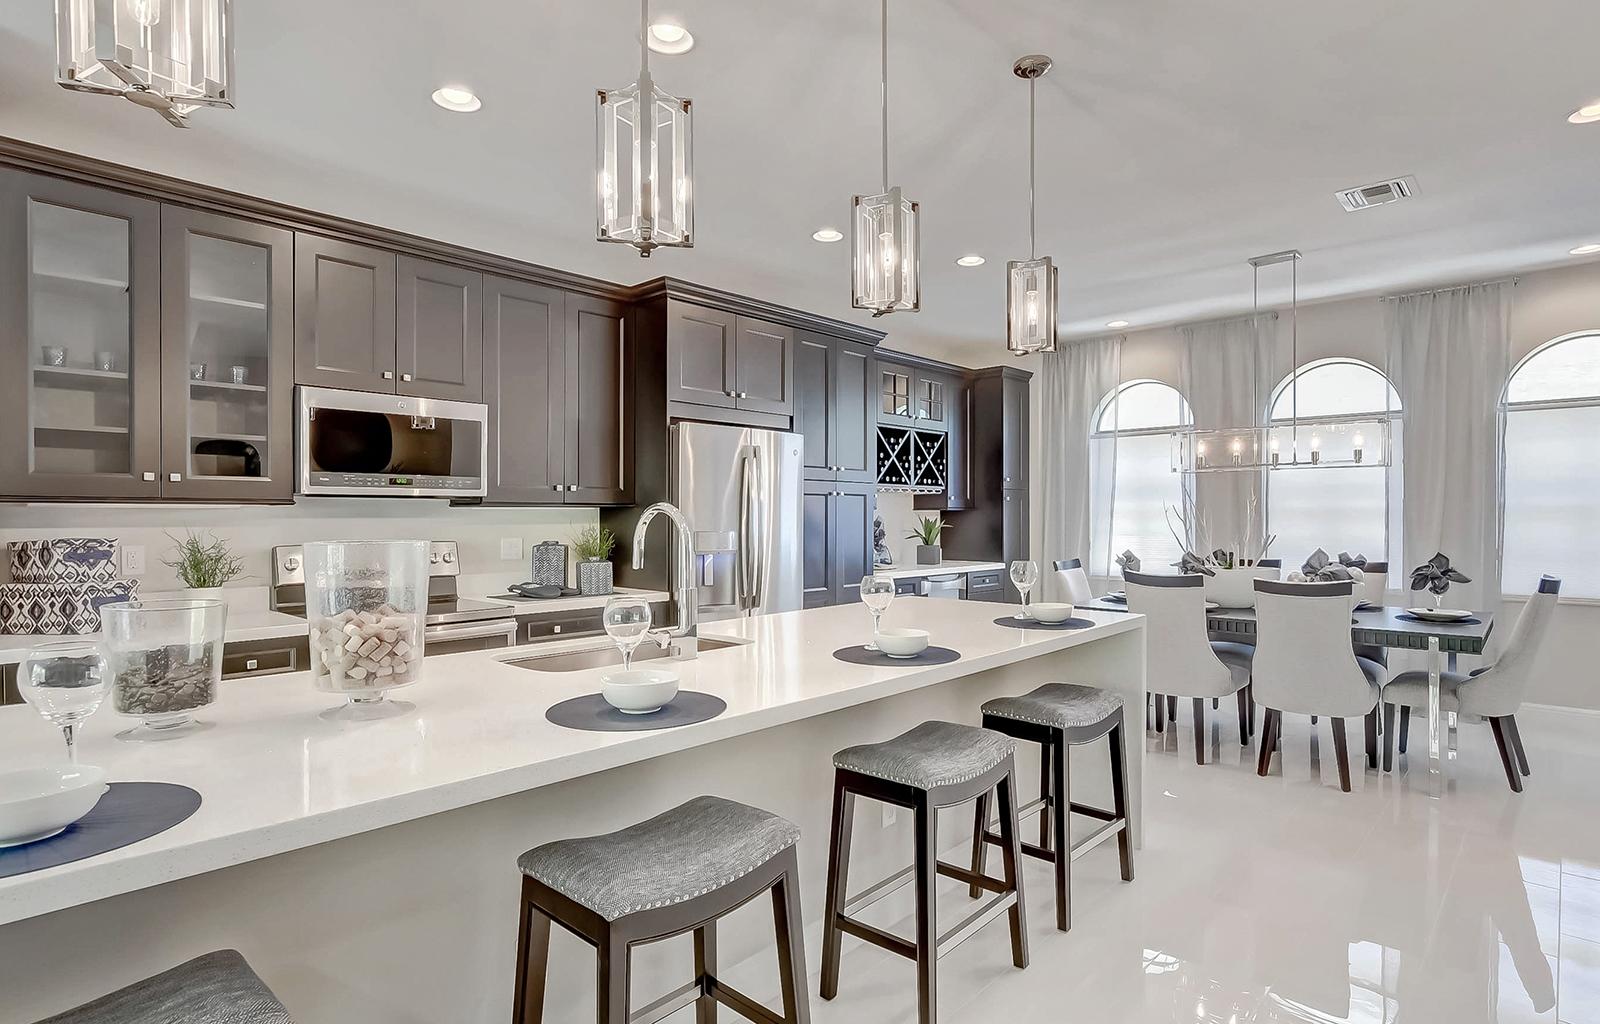 4 Simple Interior Design Ideas for New Build Homes - HOV ...